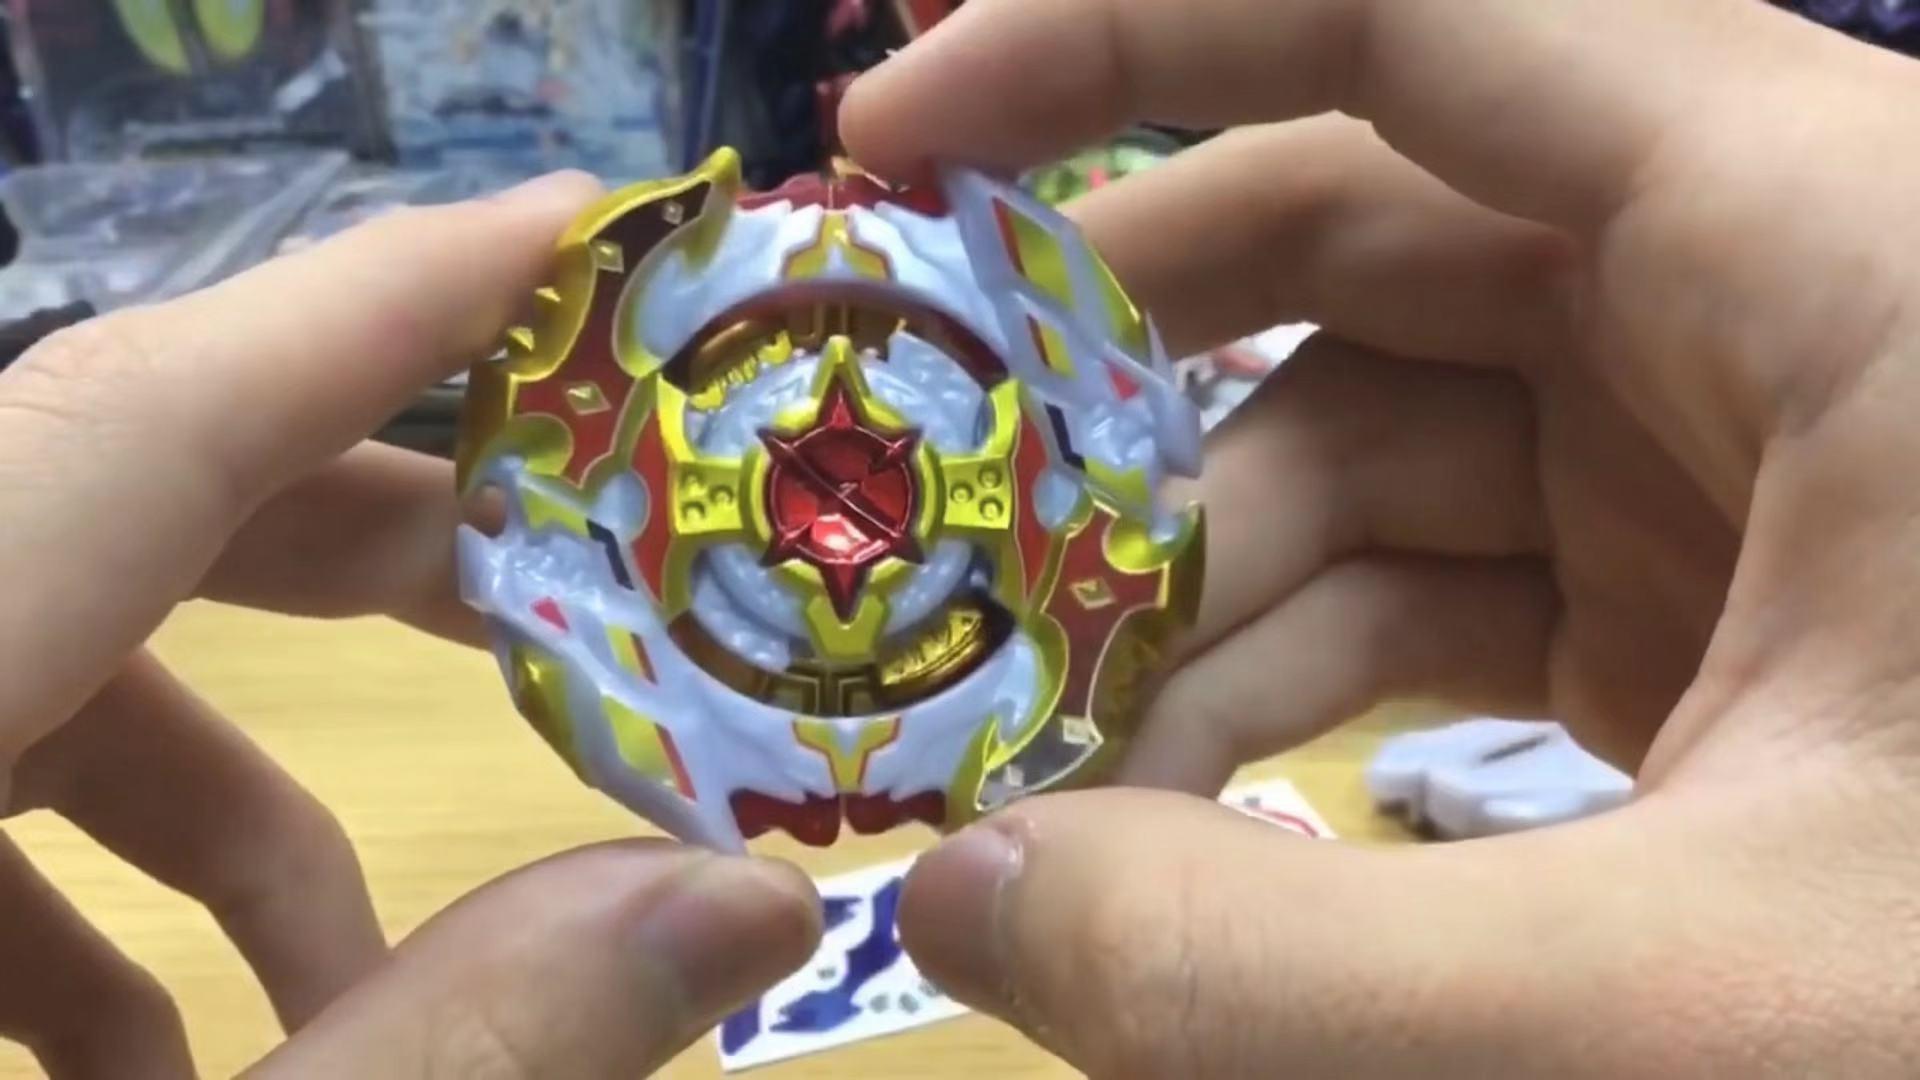 Takaratomie originale Beyblade rafale B-00 CHO-Z Super Z Spragan (roi Royal Ver.). 10.Jl bey lame bayblade Top Spinner jouet pour garçon